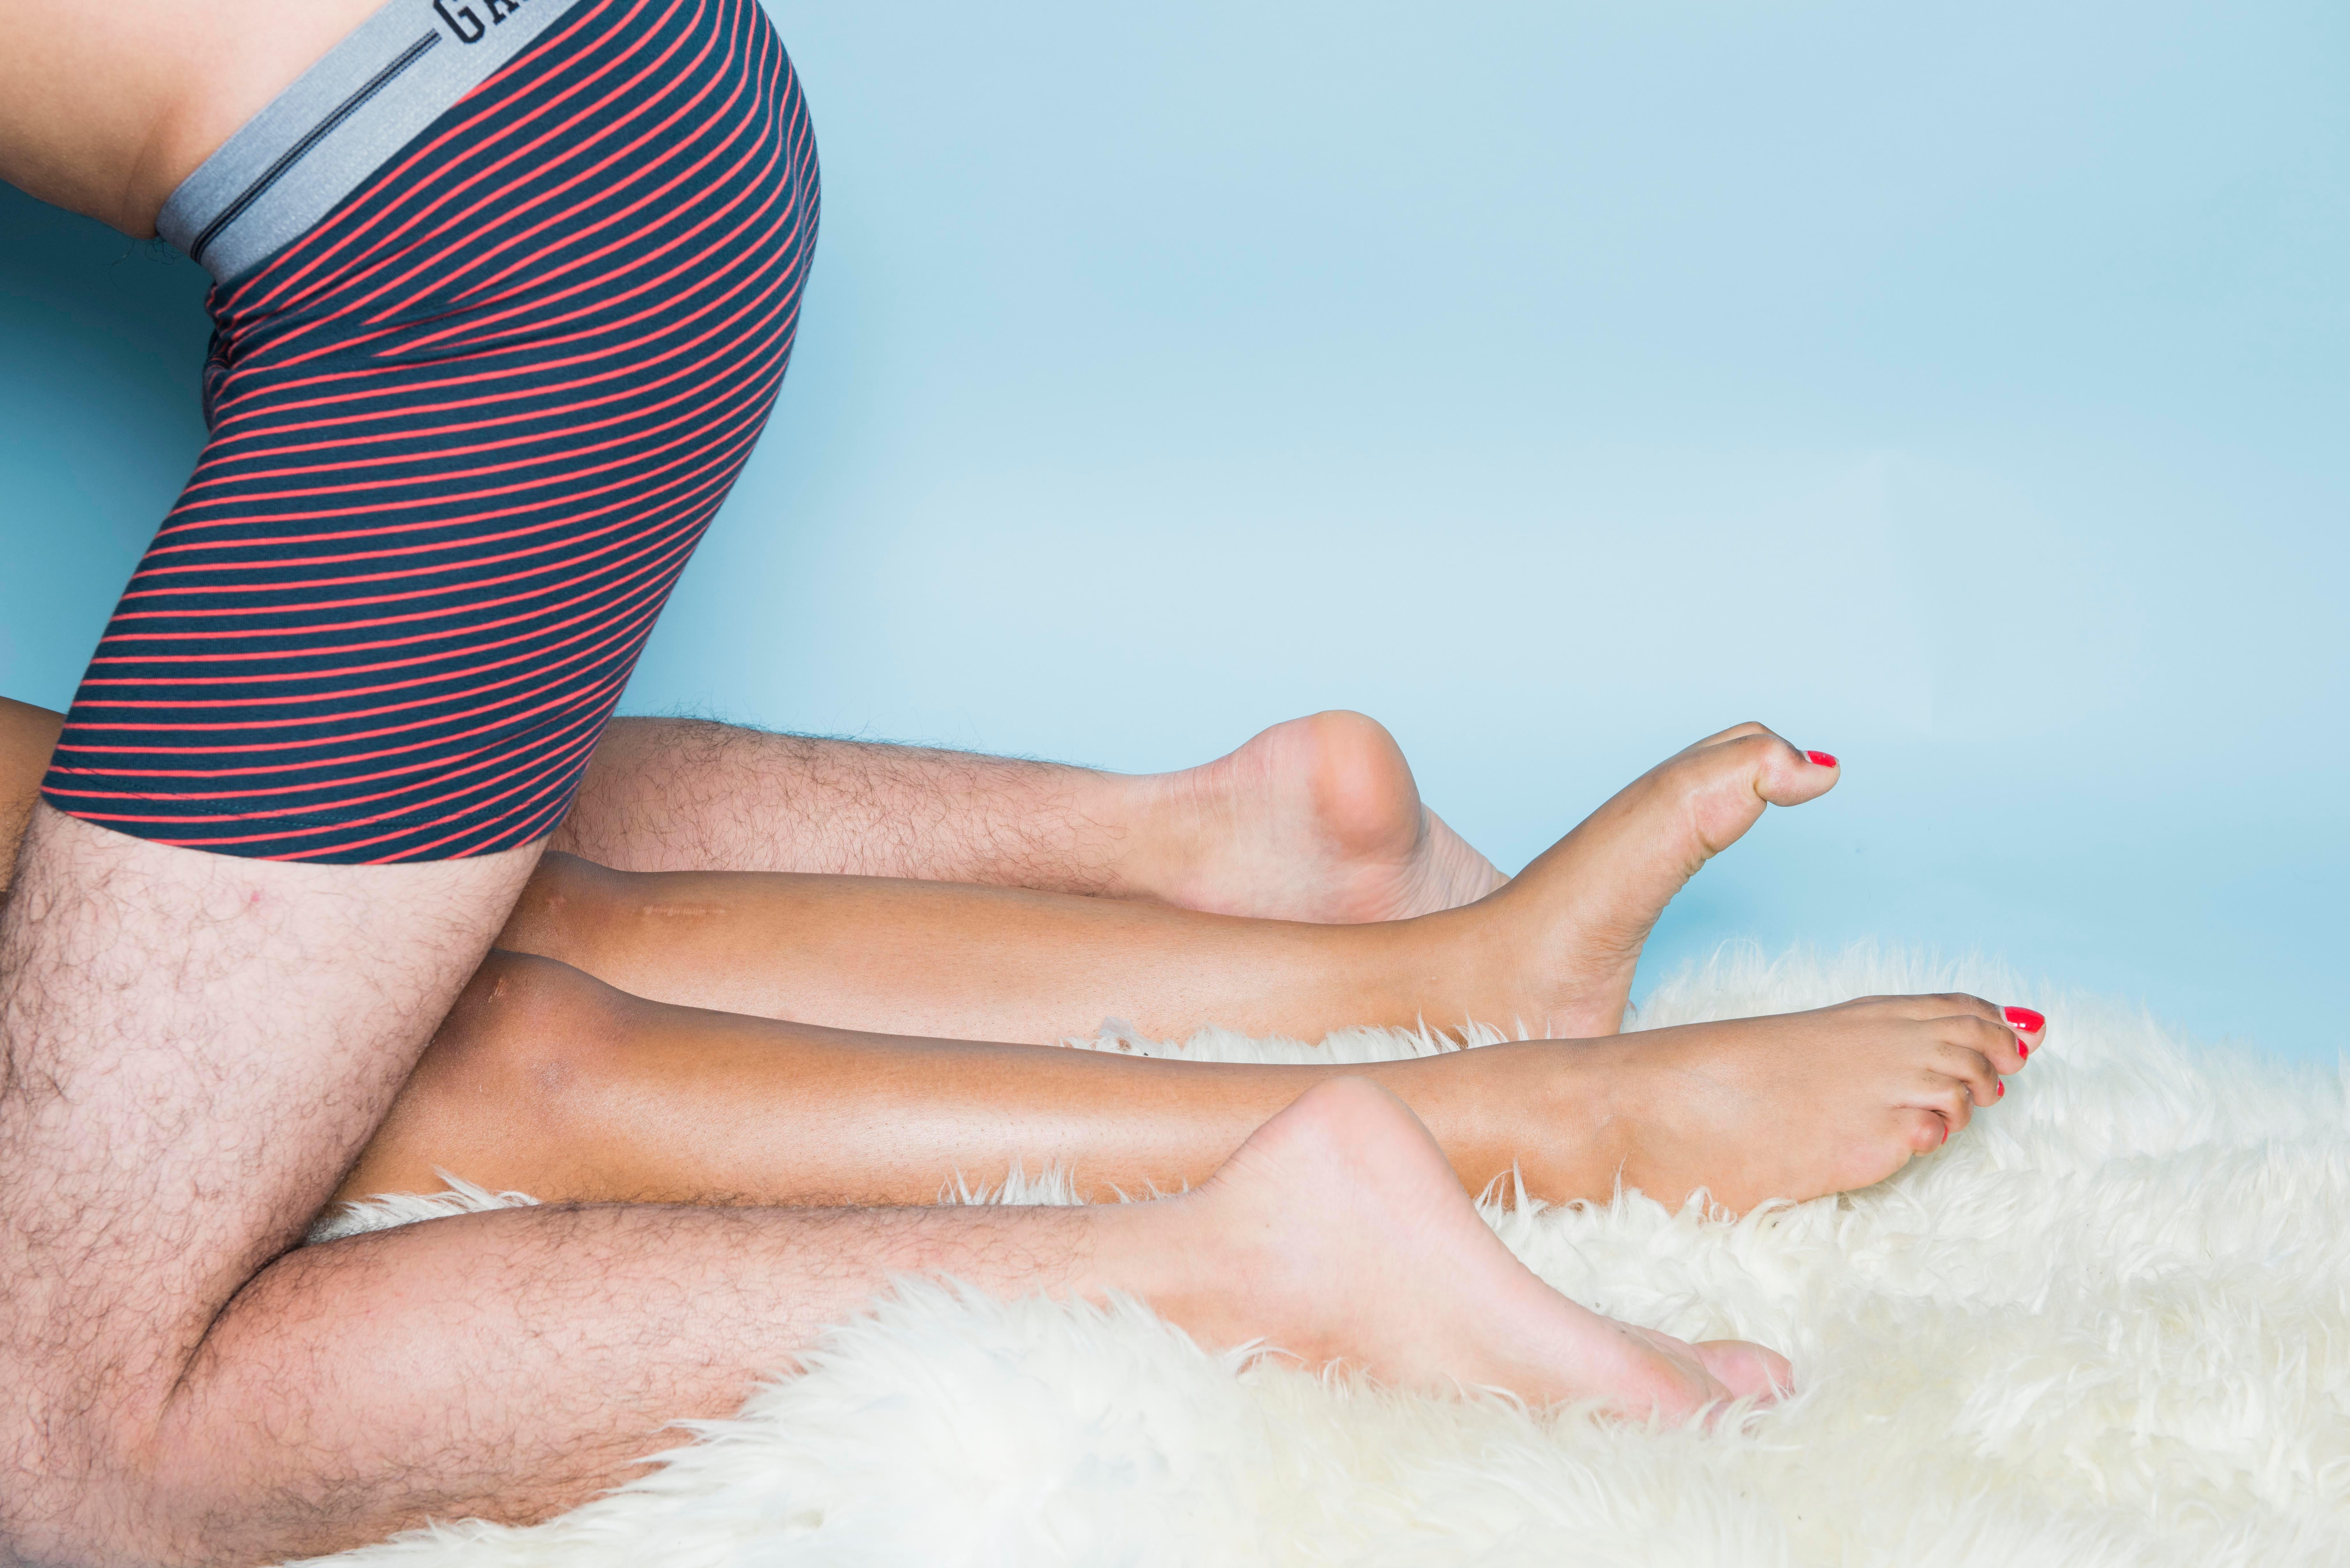 Big ass ebony porn videos